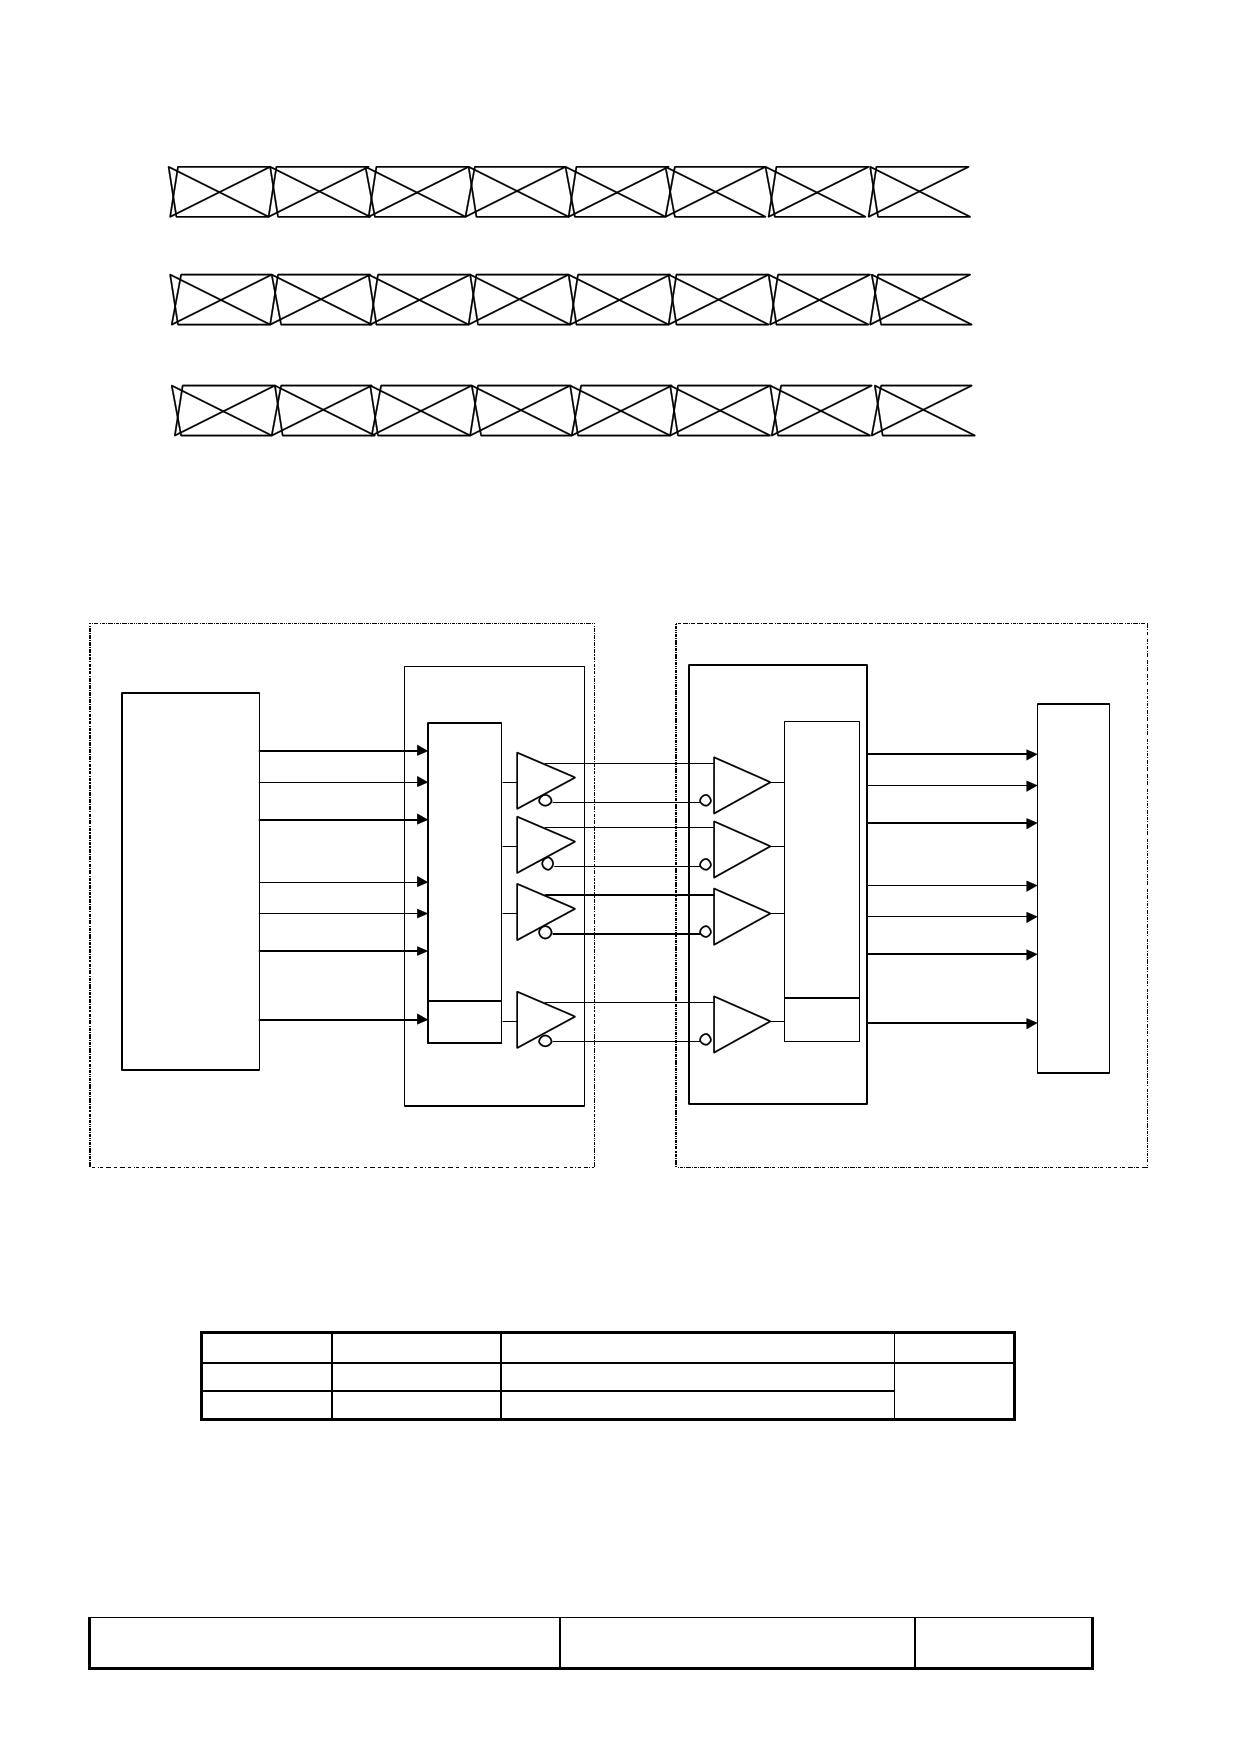 T-51410D104J-FW-P-AC pdf, arduino